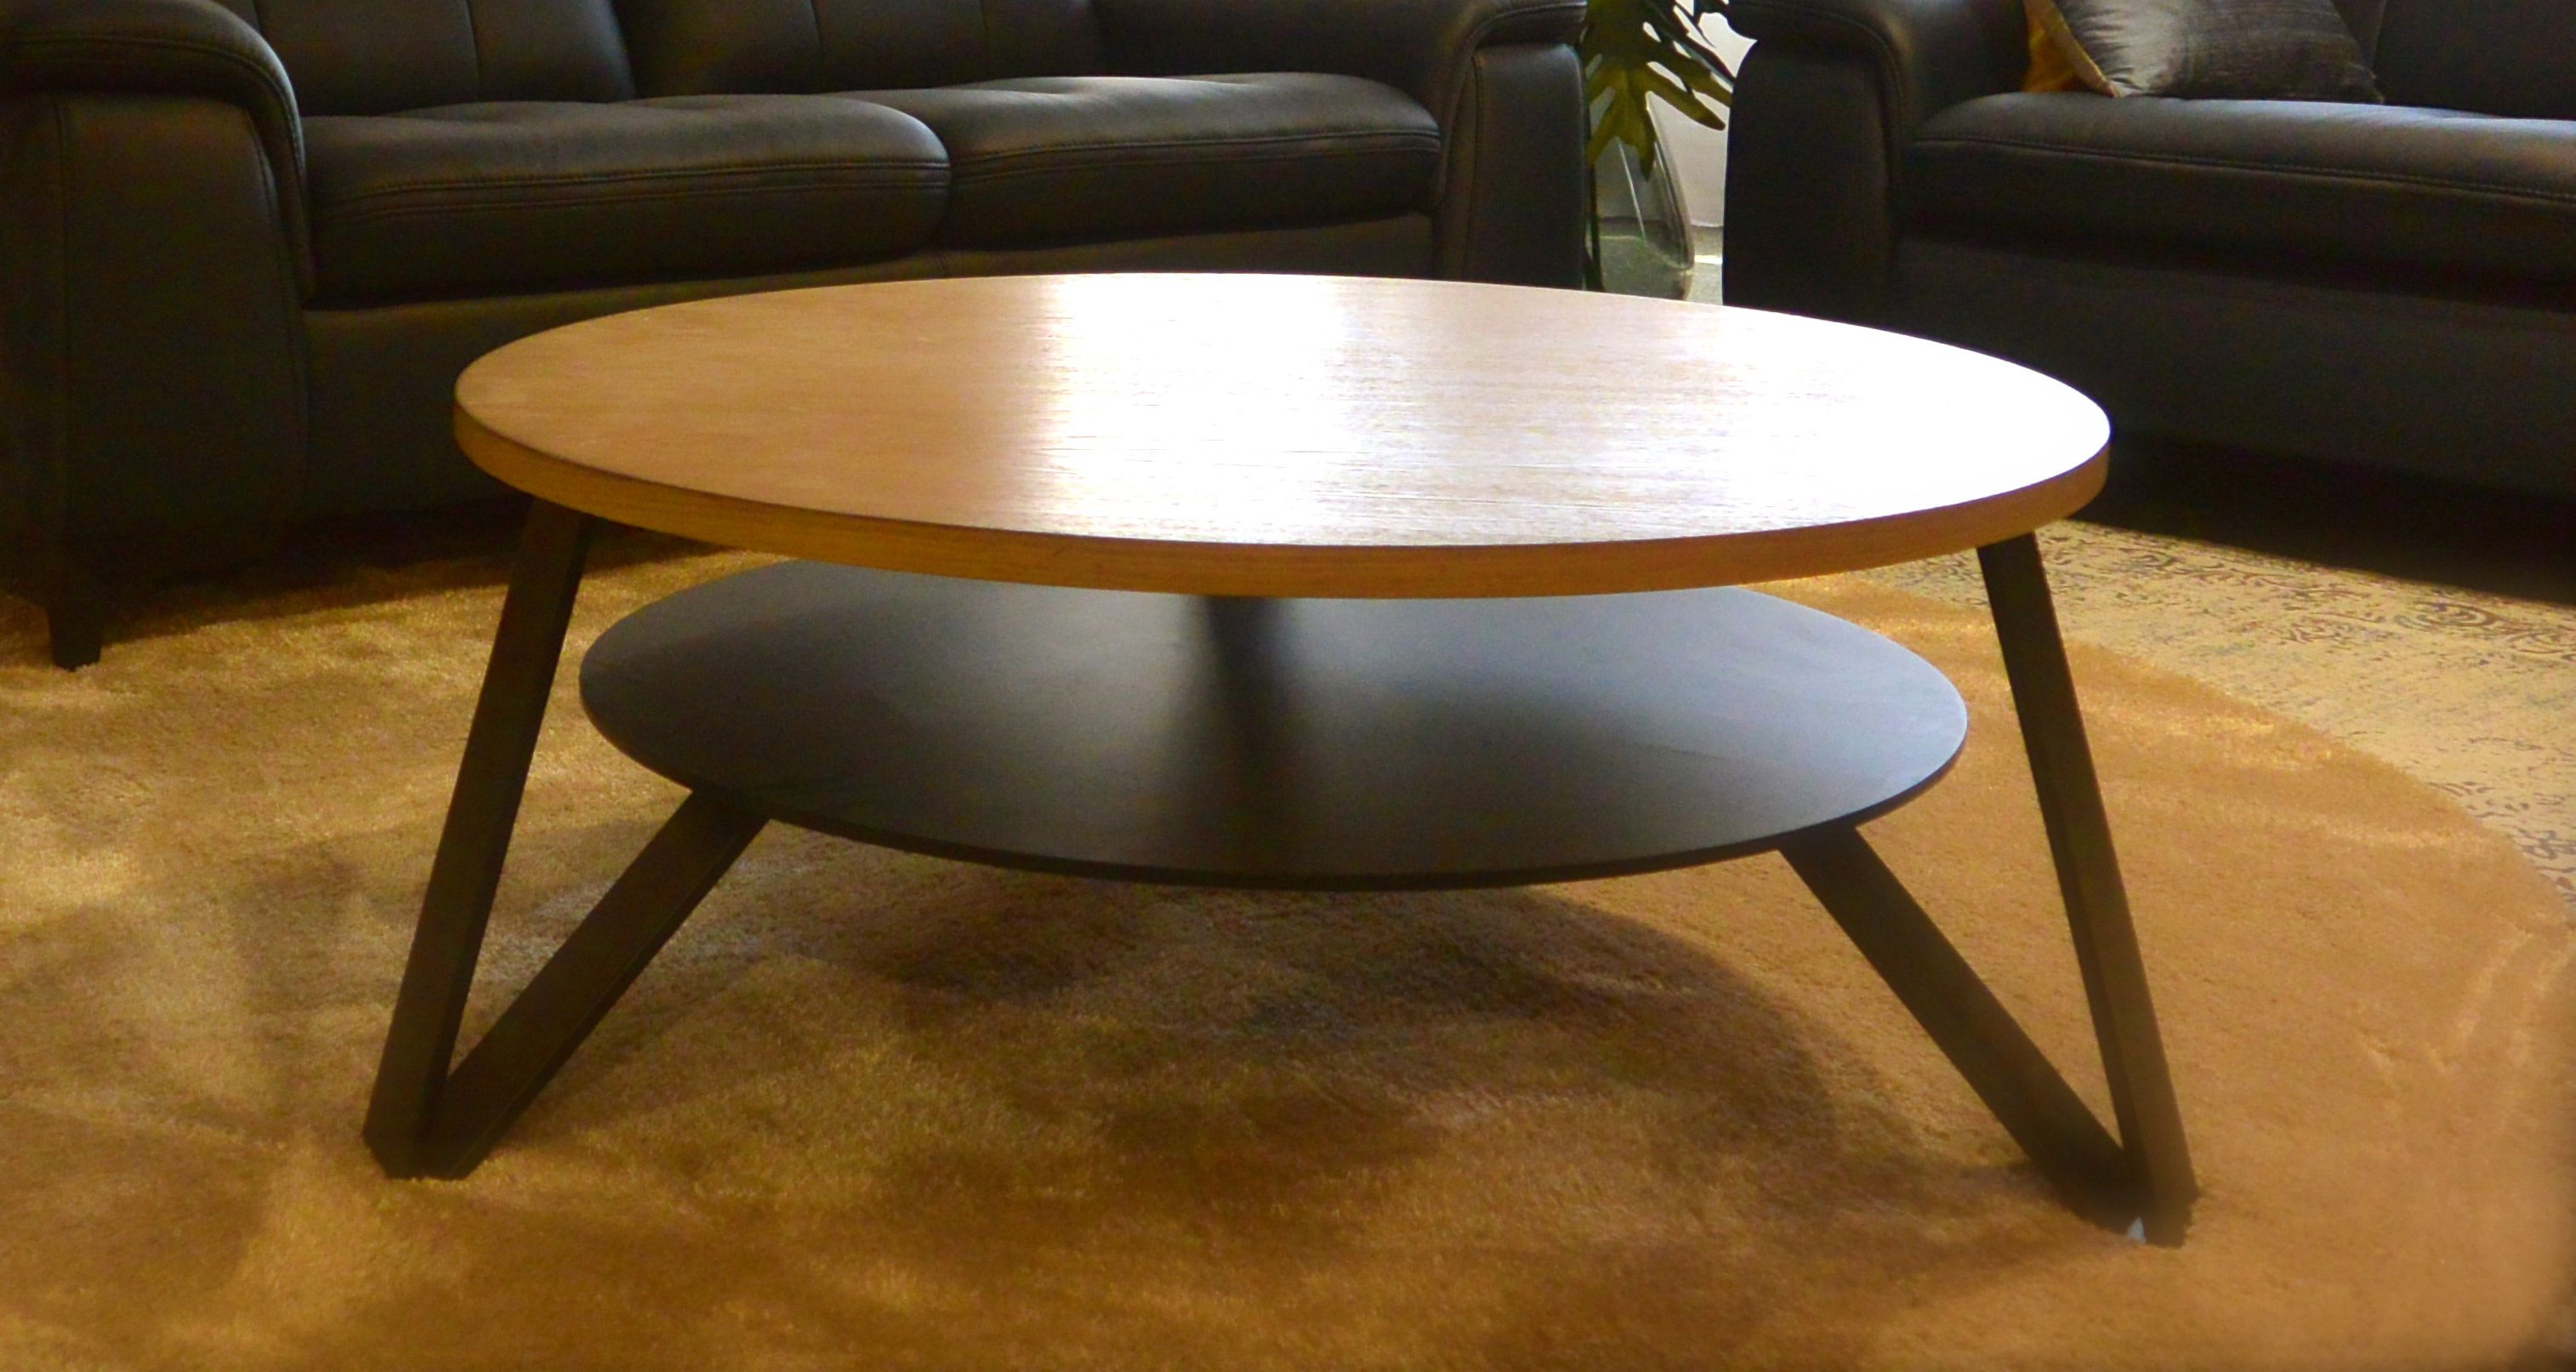 Table Basse Nude En Exclusivit Dans Vos Magasins Monsieur Meuble  # Monsieur Meuble Table Tv